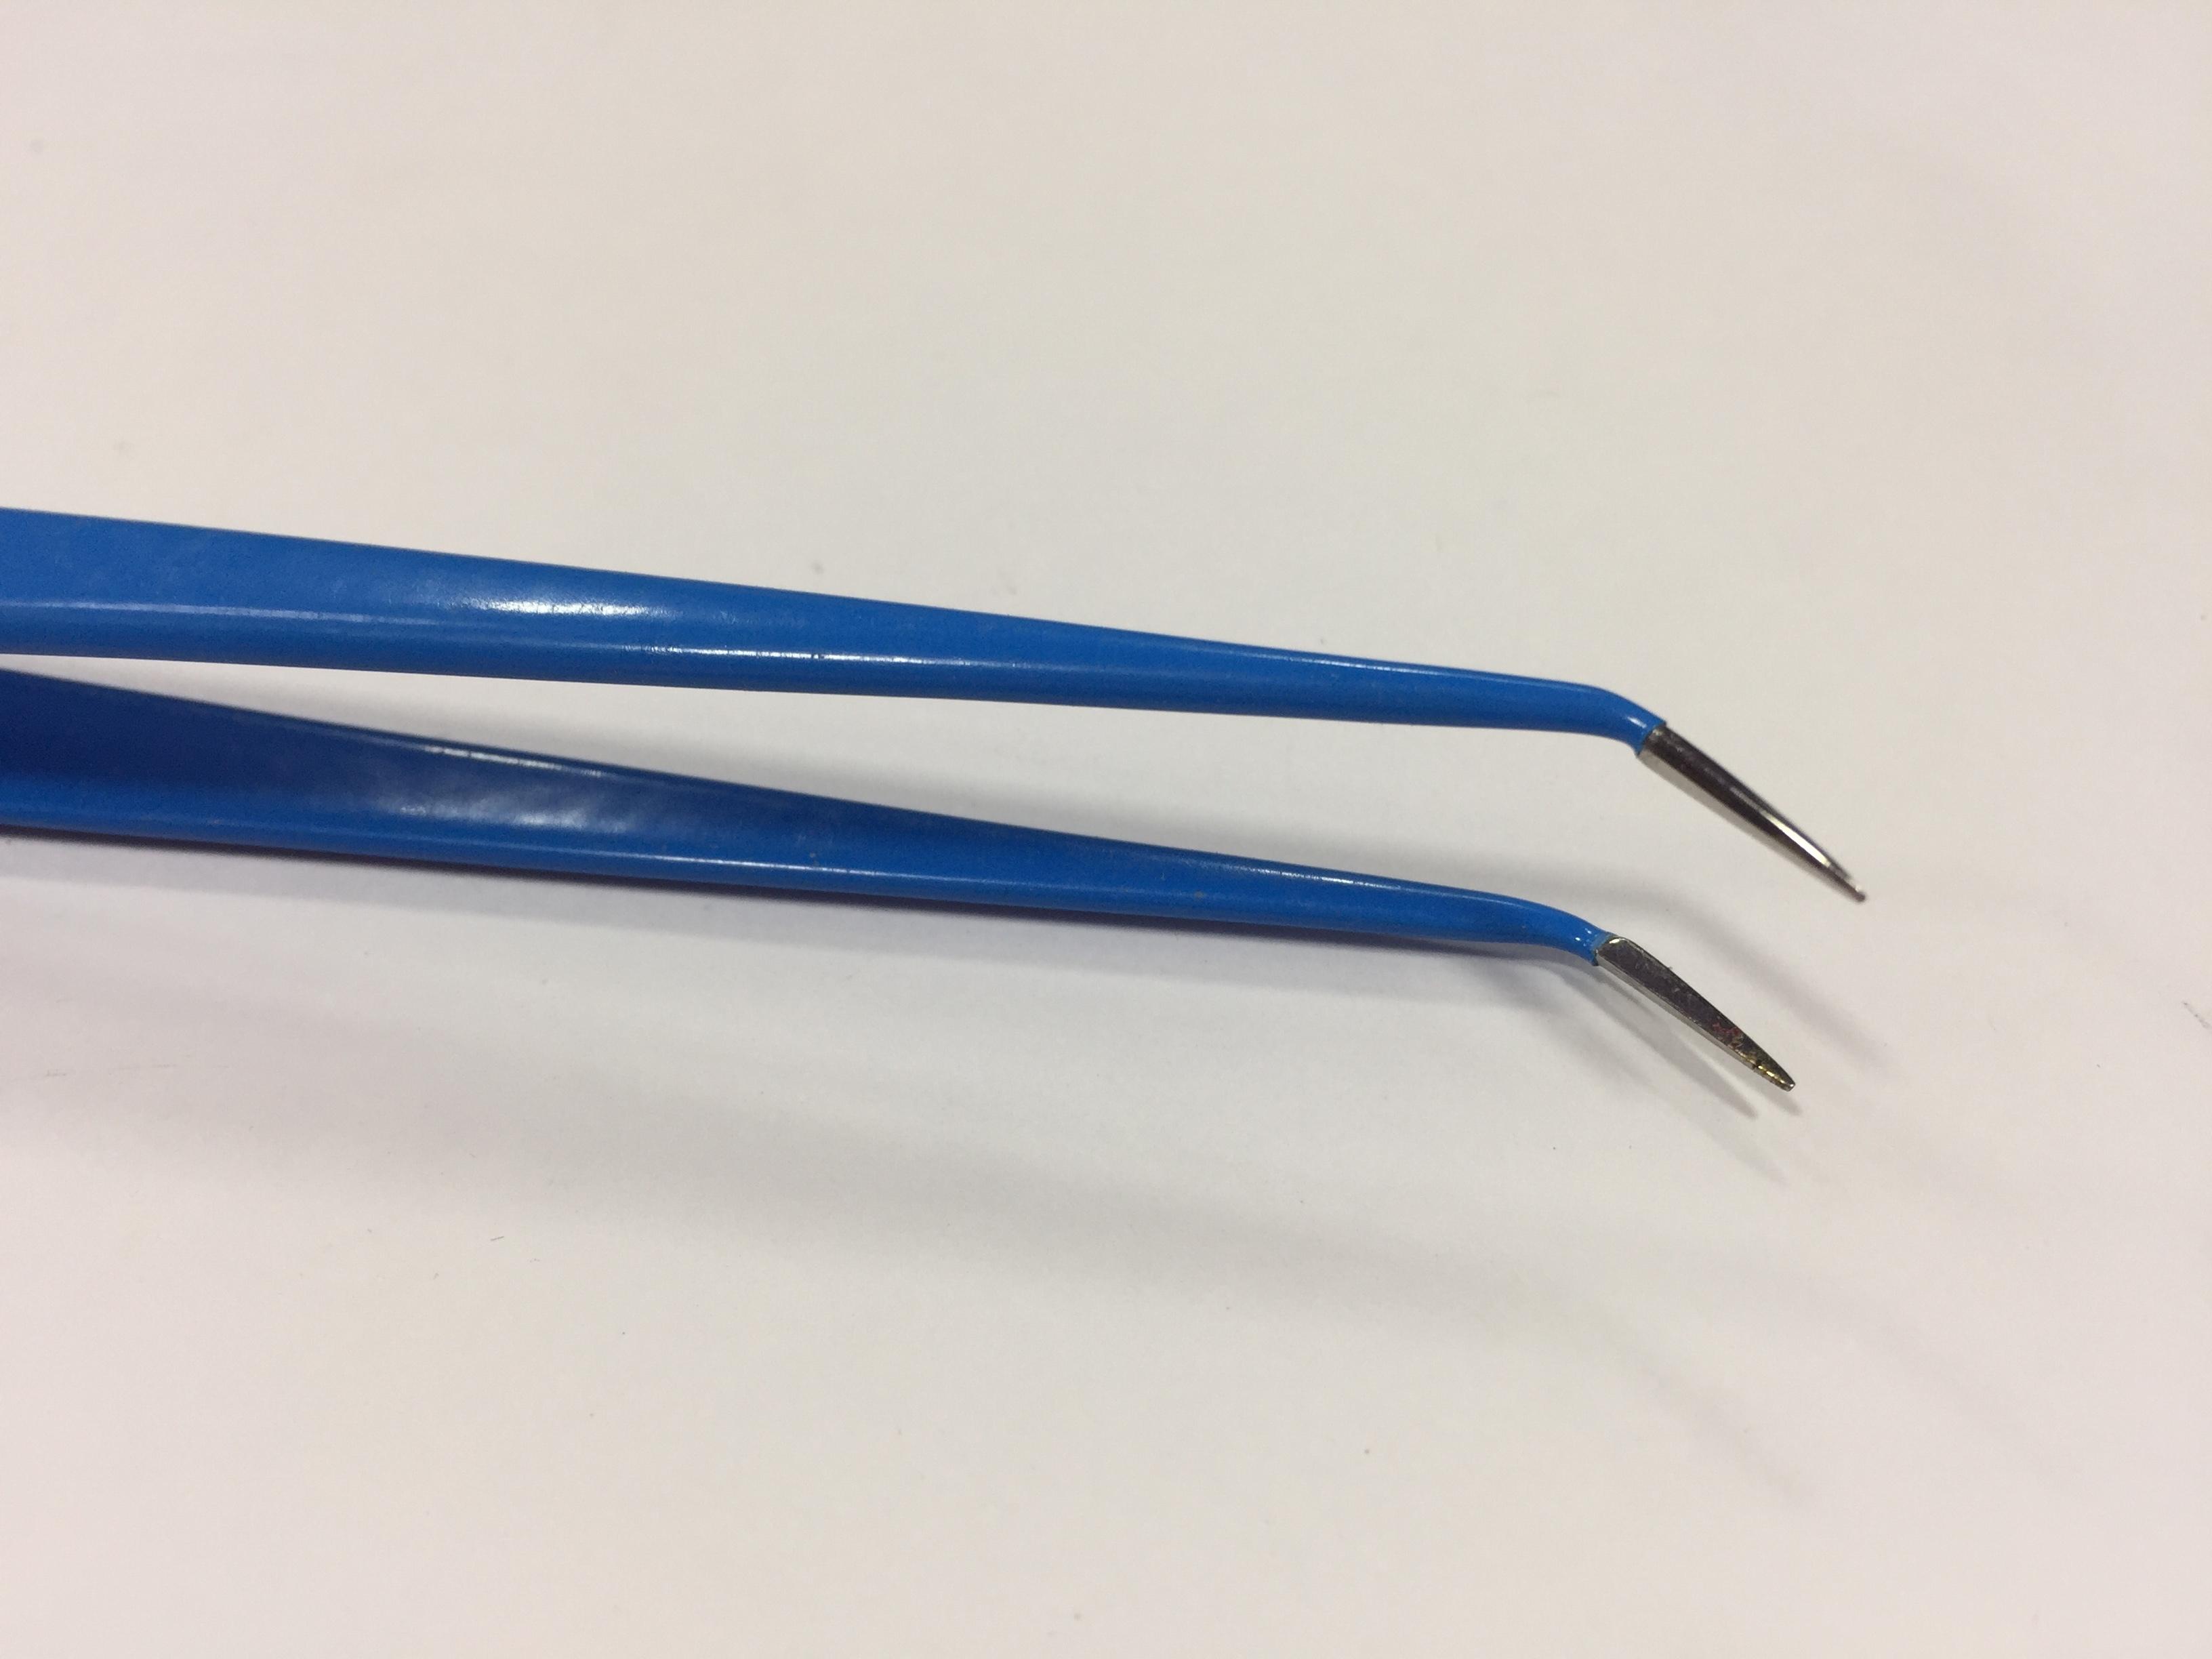 Bipolar angular Forceps 11cm